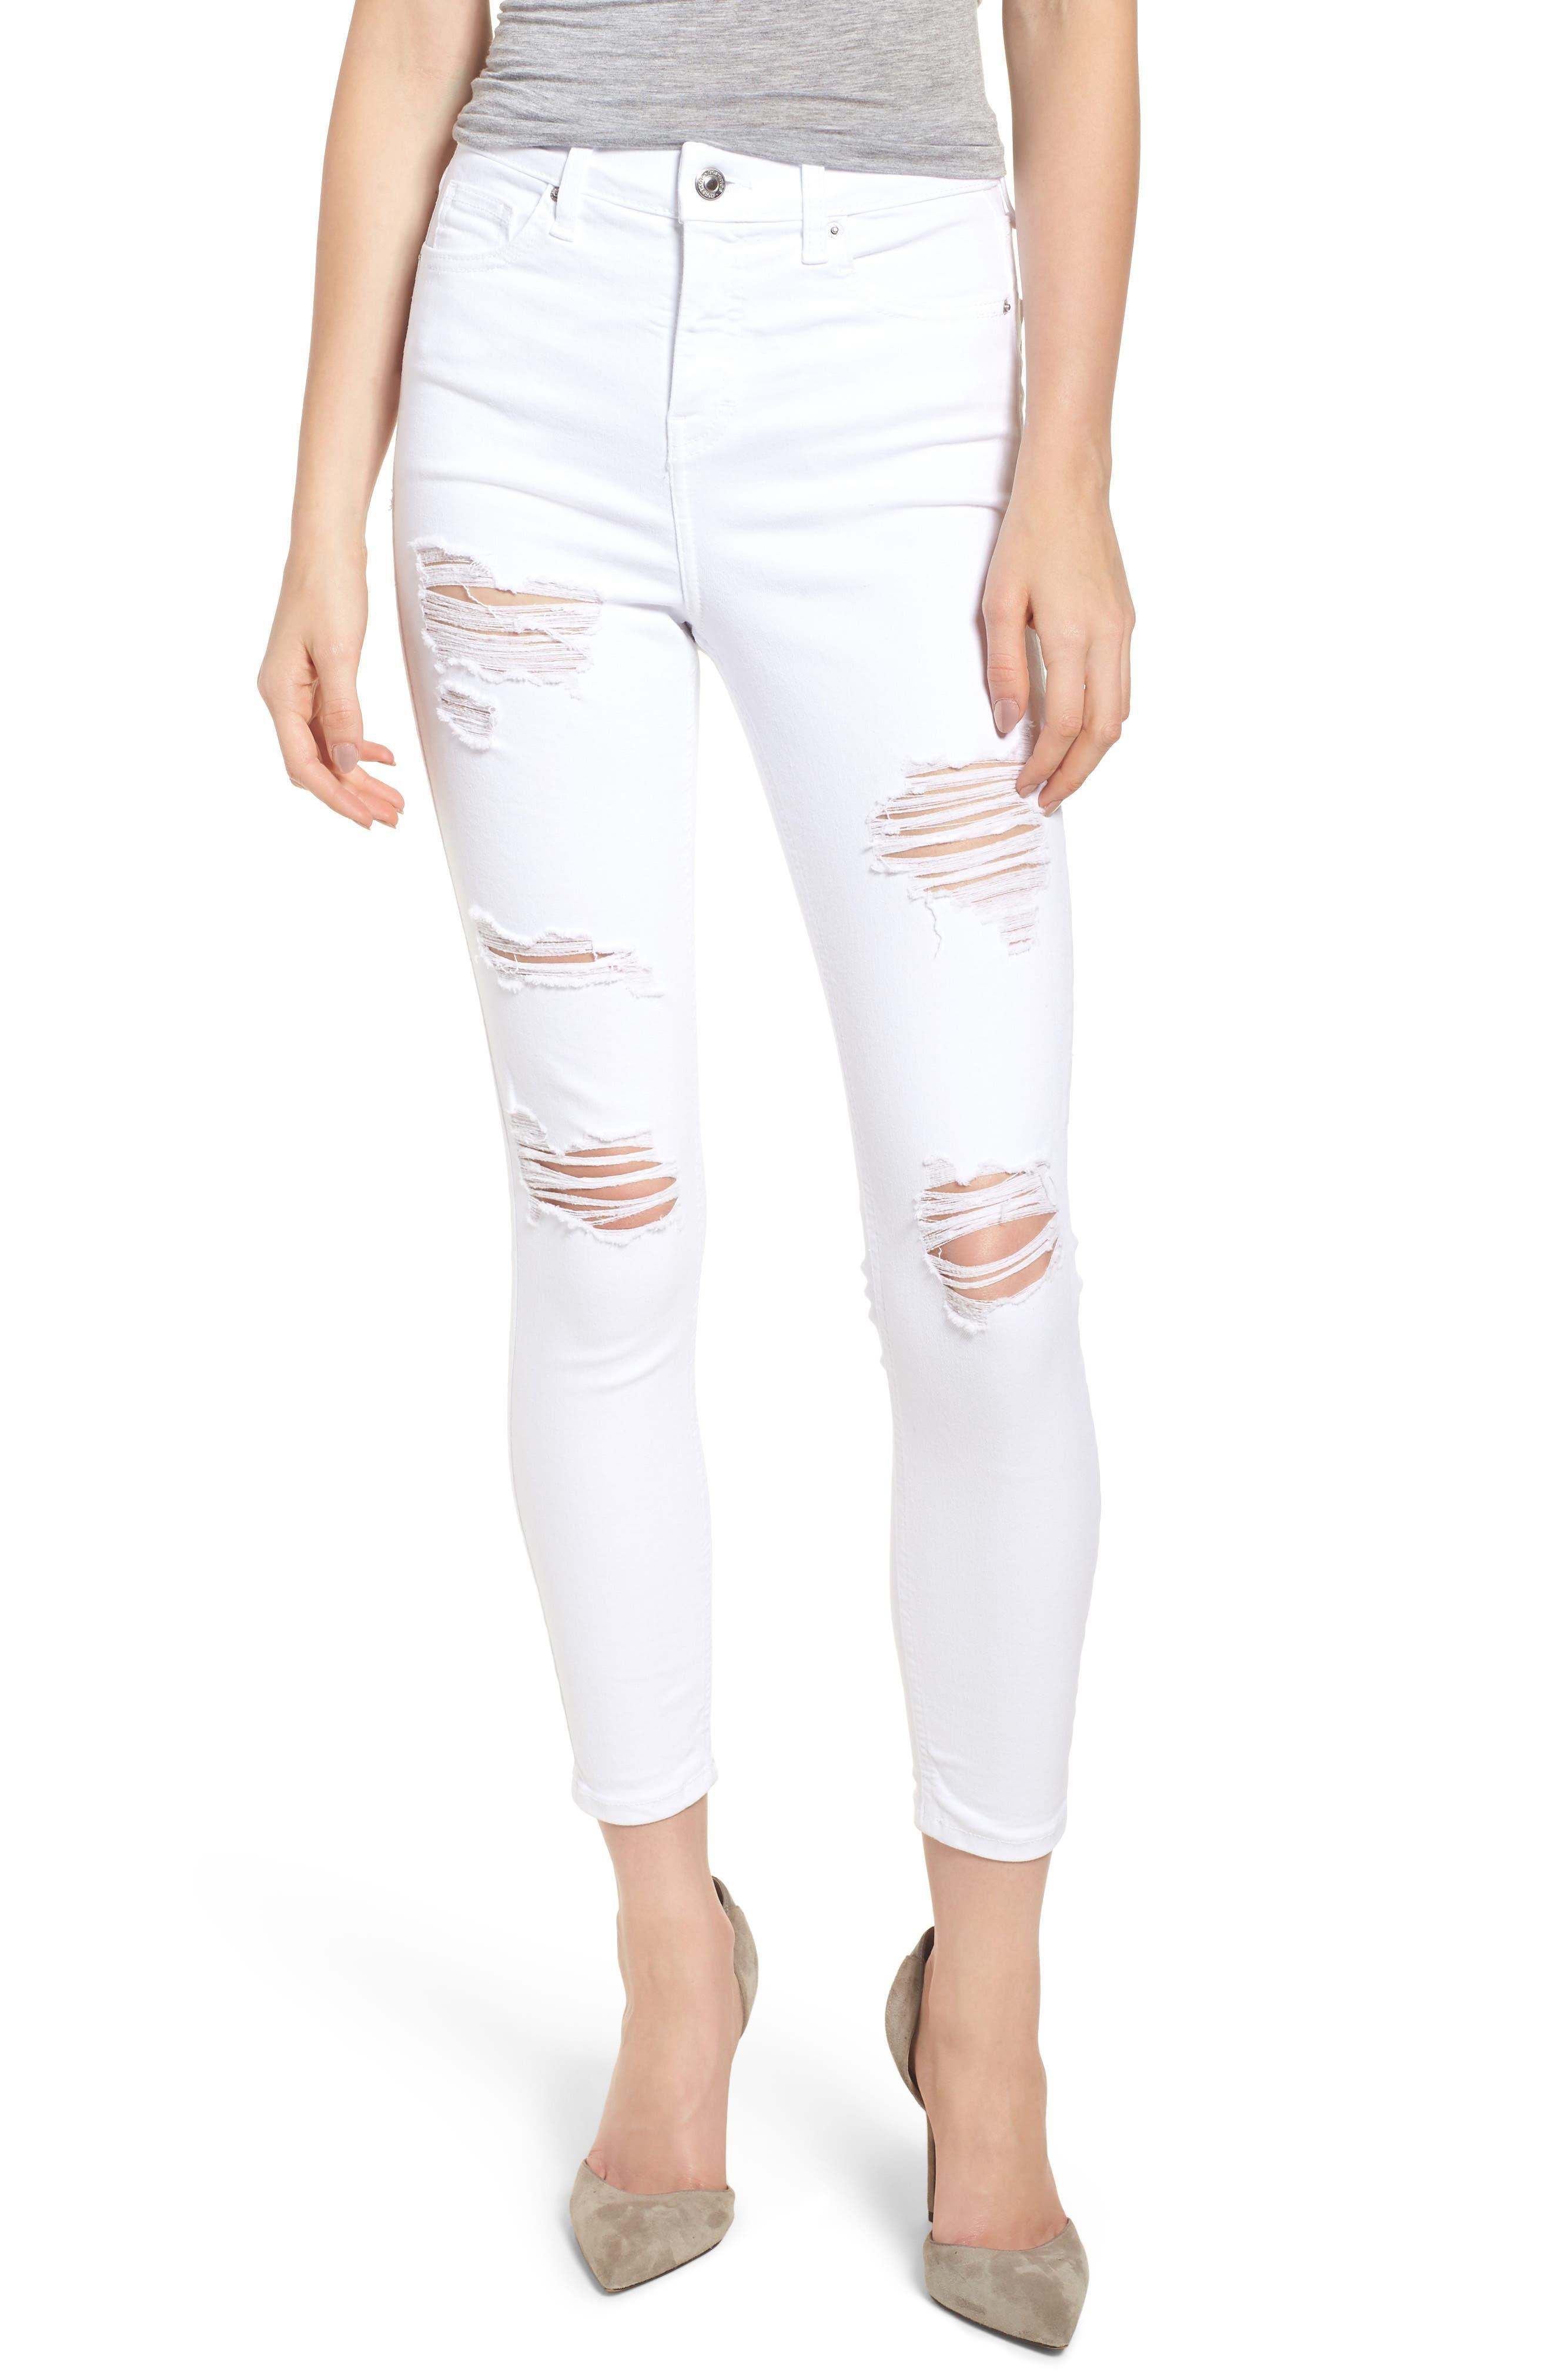 Topshop Jamie Super Rip Jeans